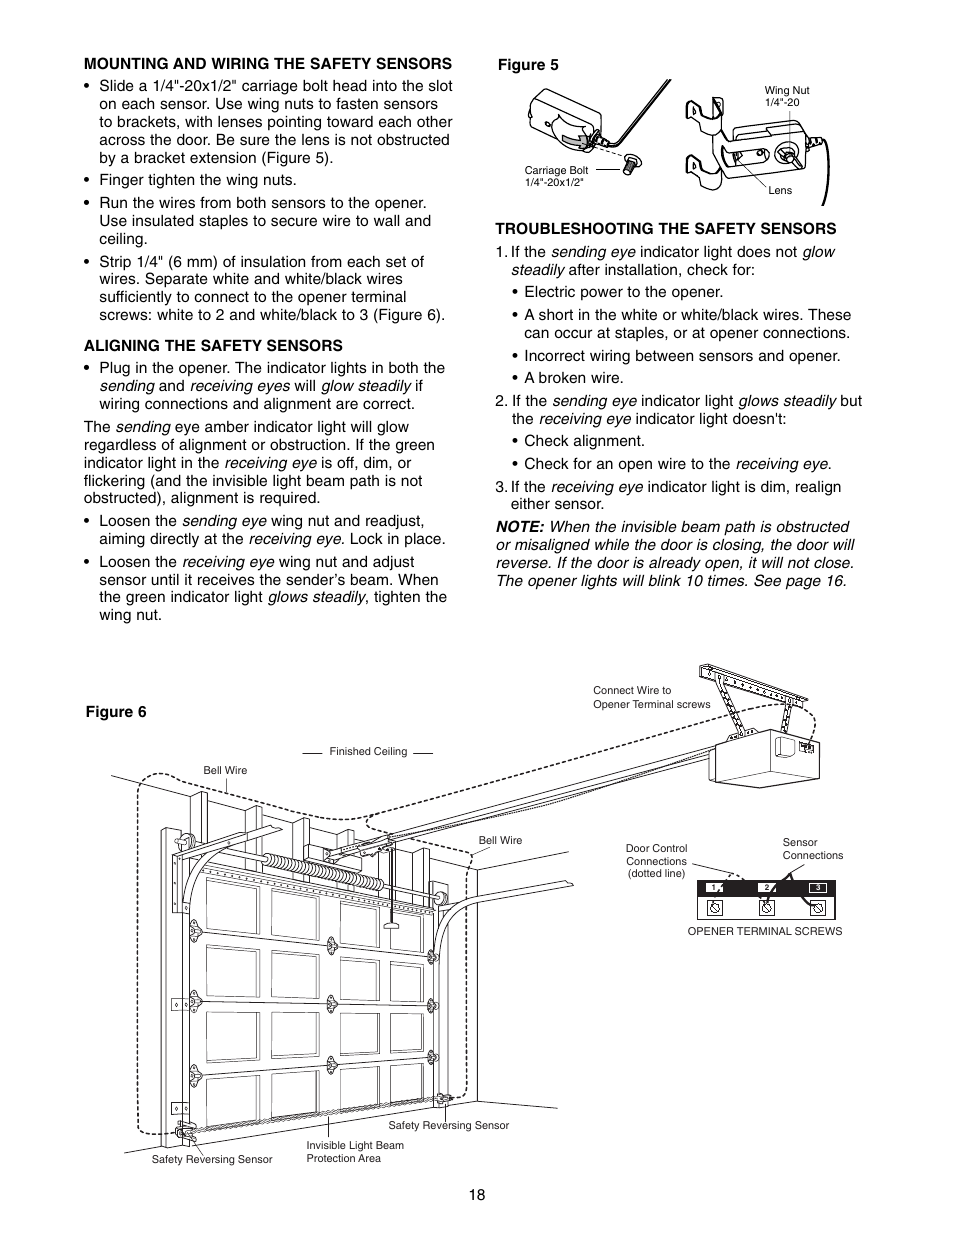 Cloth Wiring Hazards Manual Guide